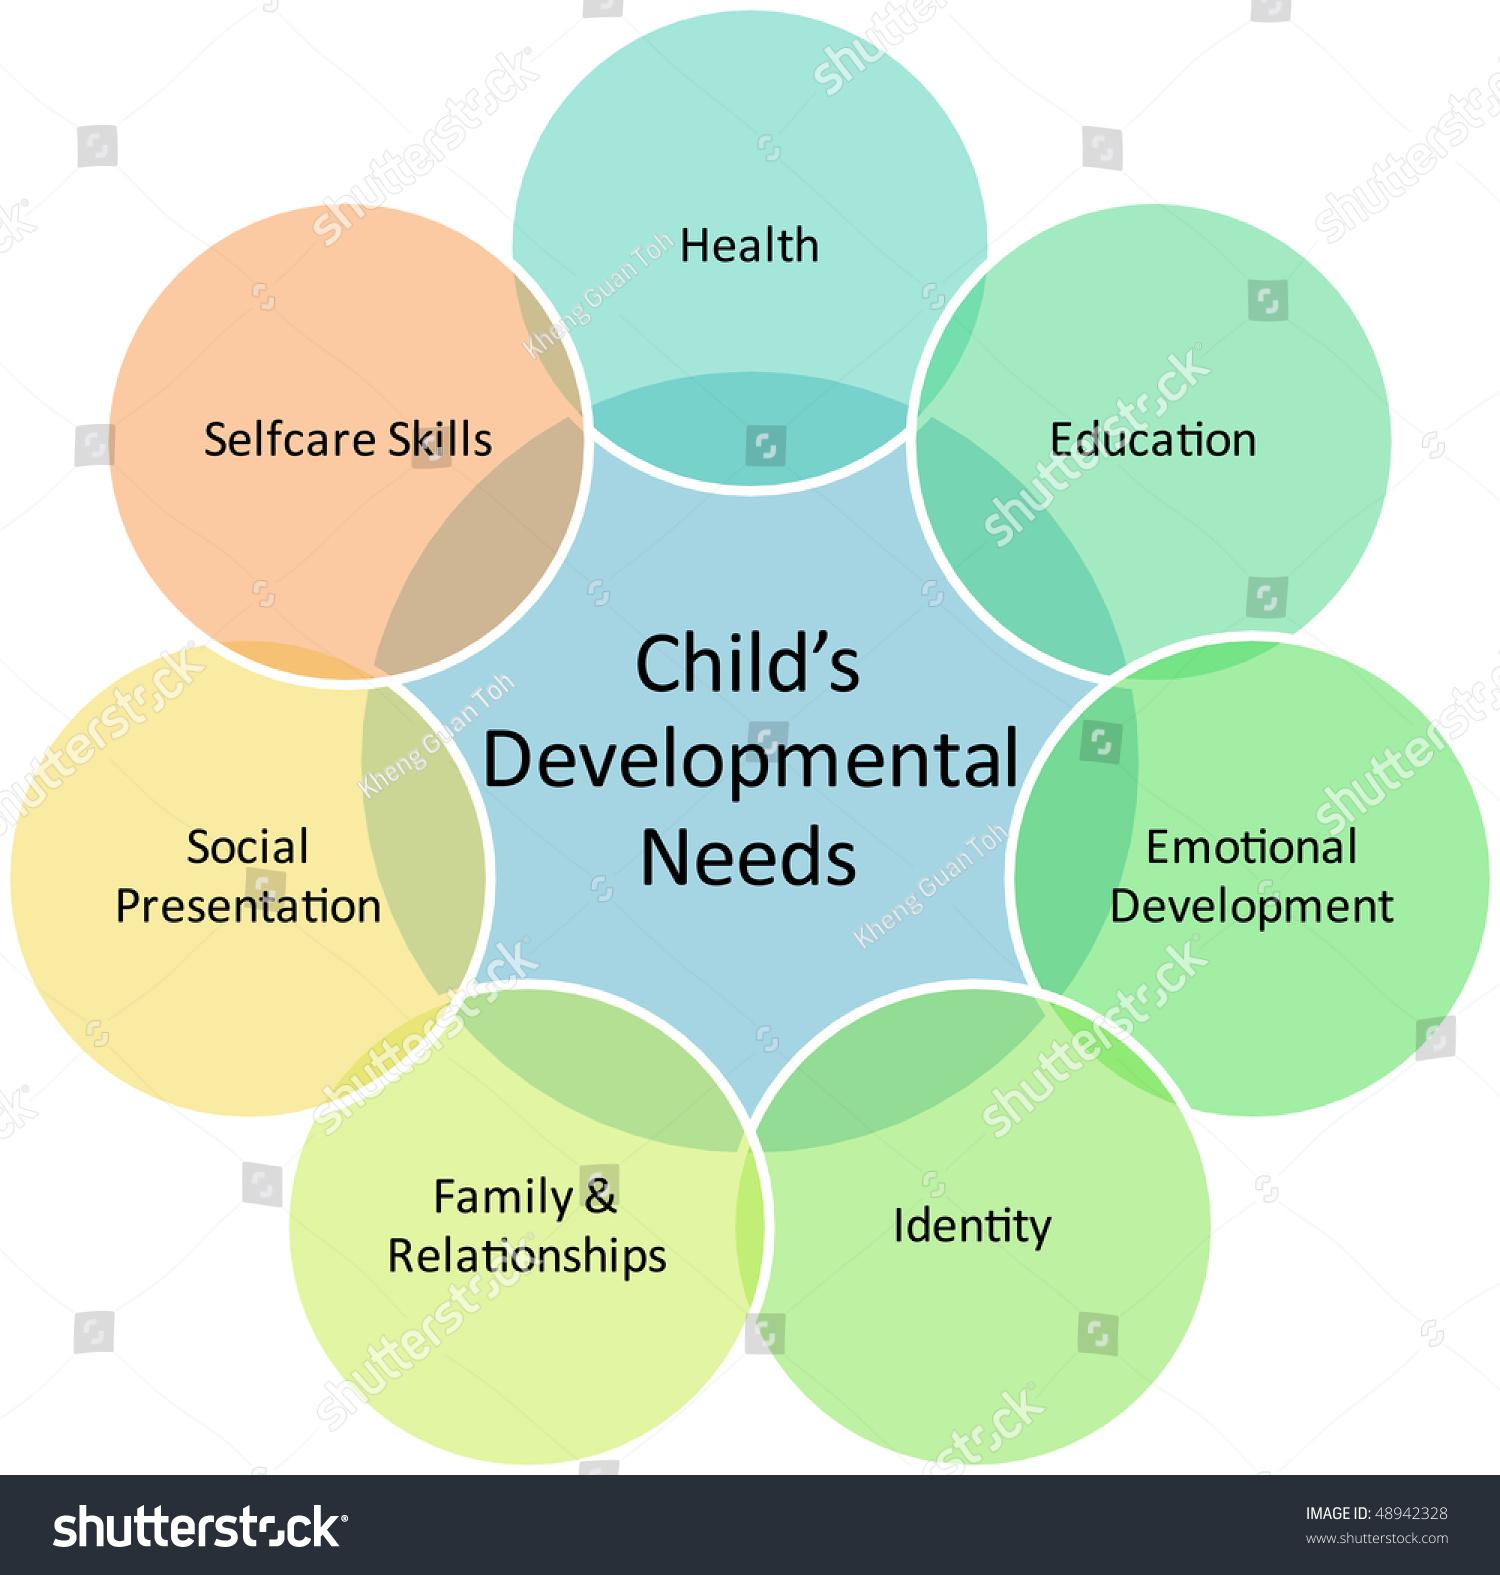 Child Development Management Business Strategy Concept